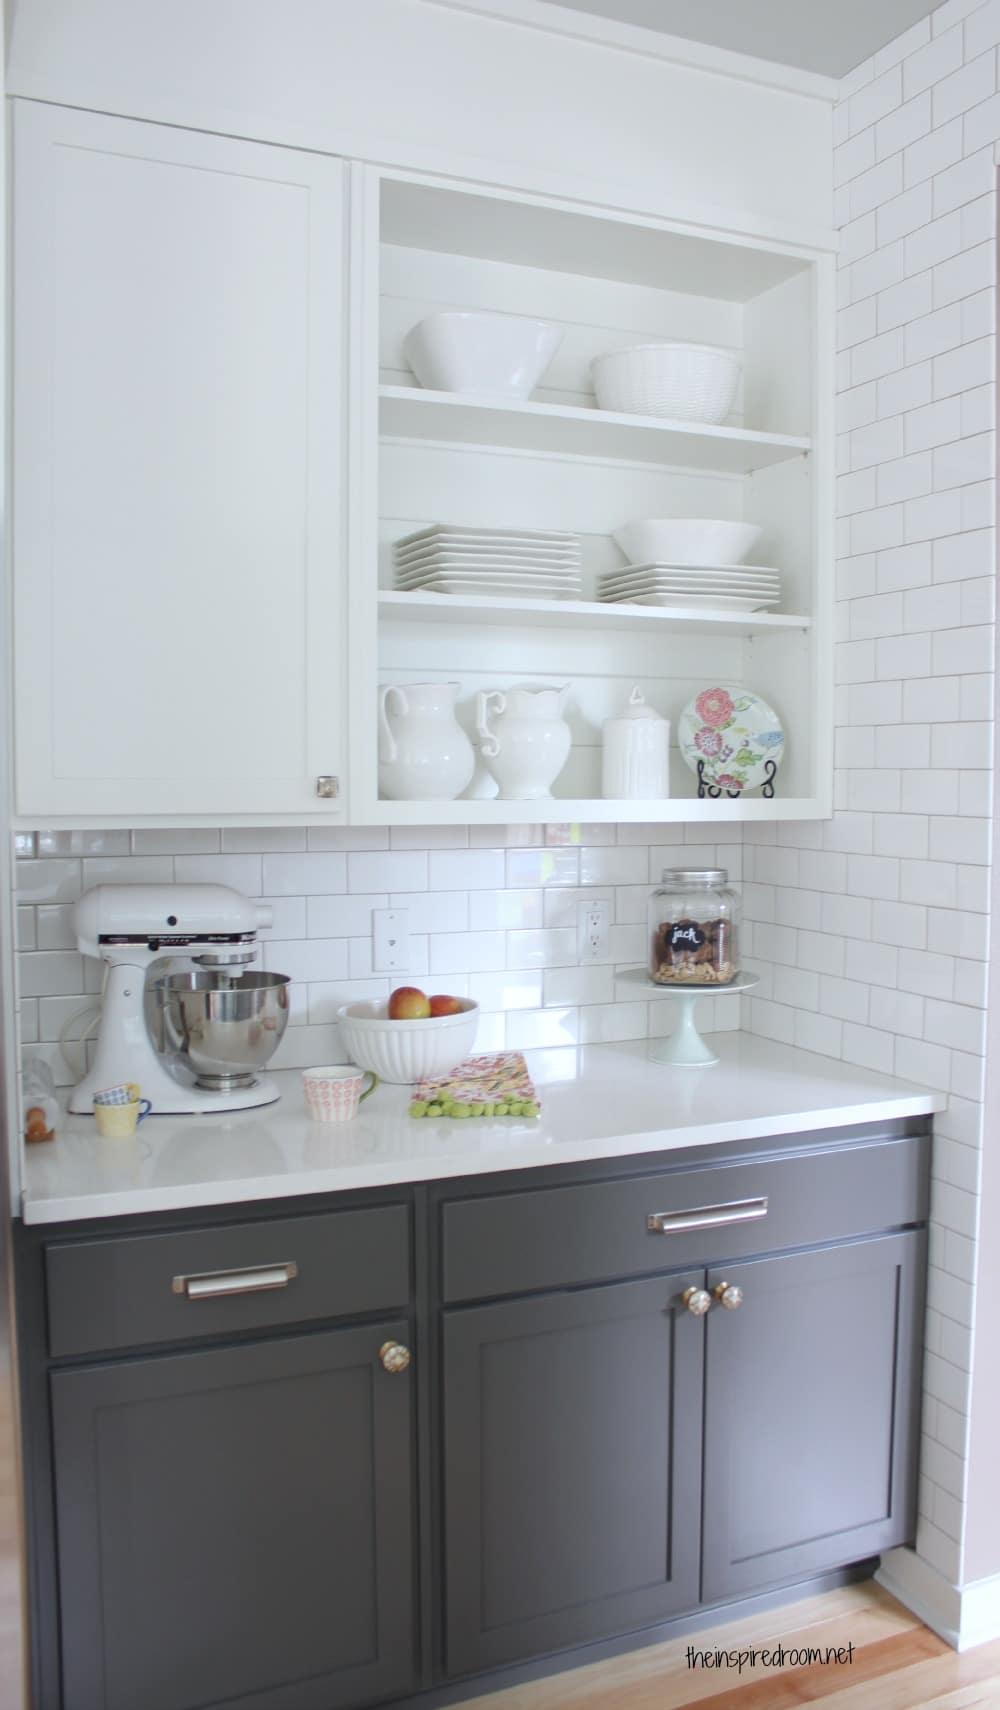 kitchen cabinet colors two tone kitchen cabinets two toned kitchen cabinets